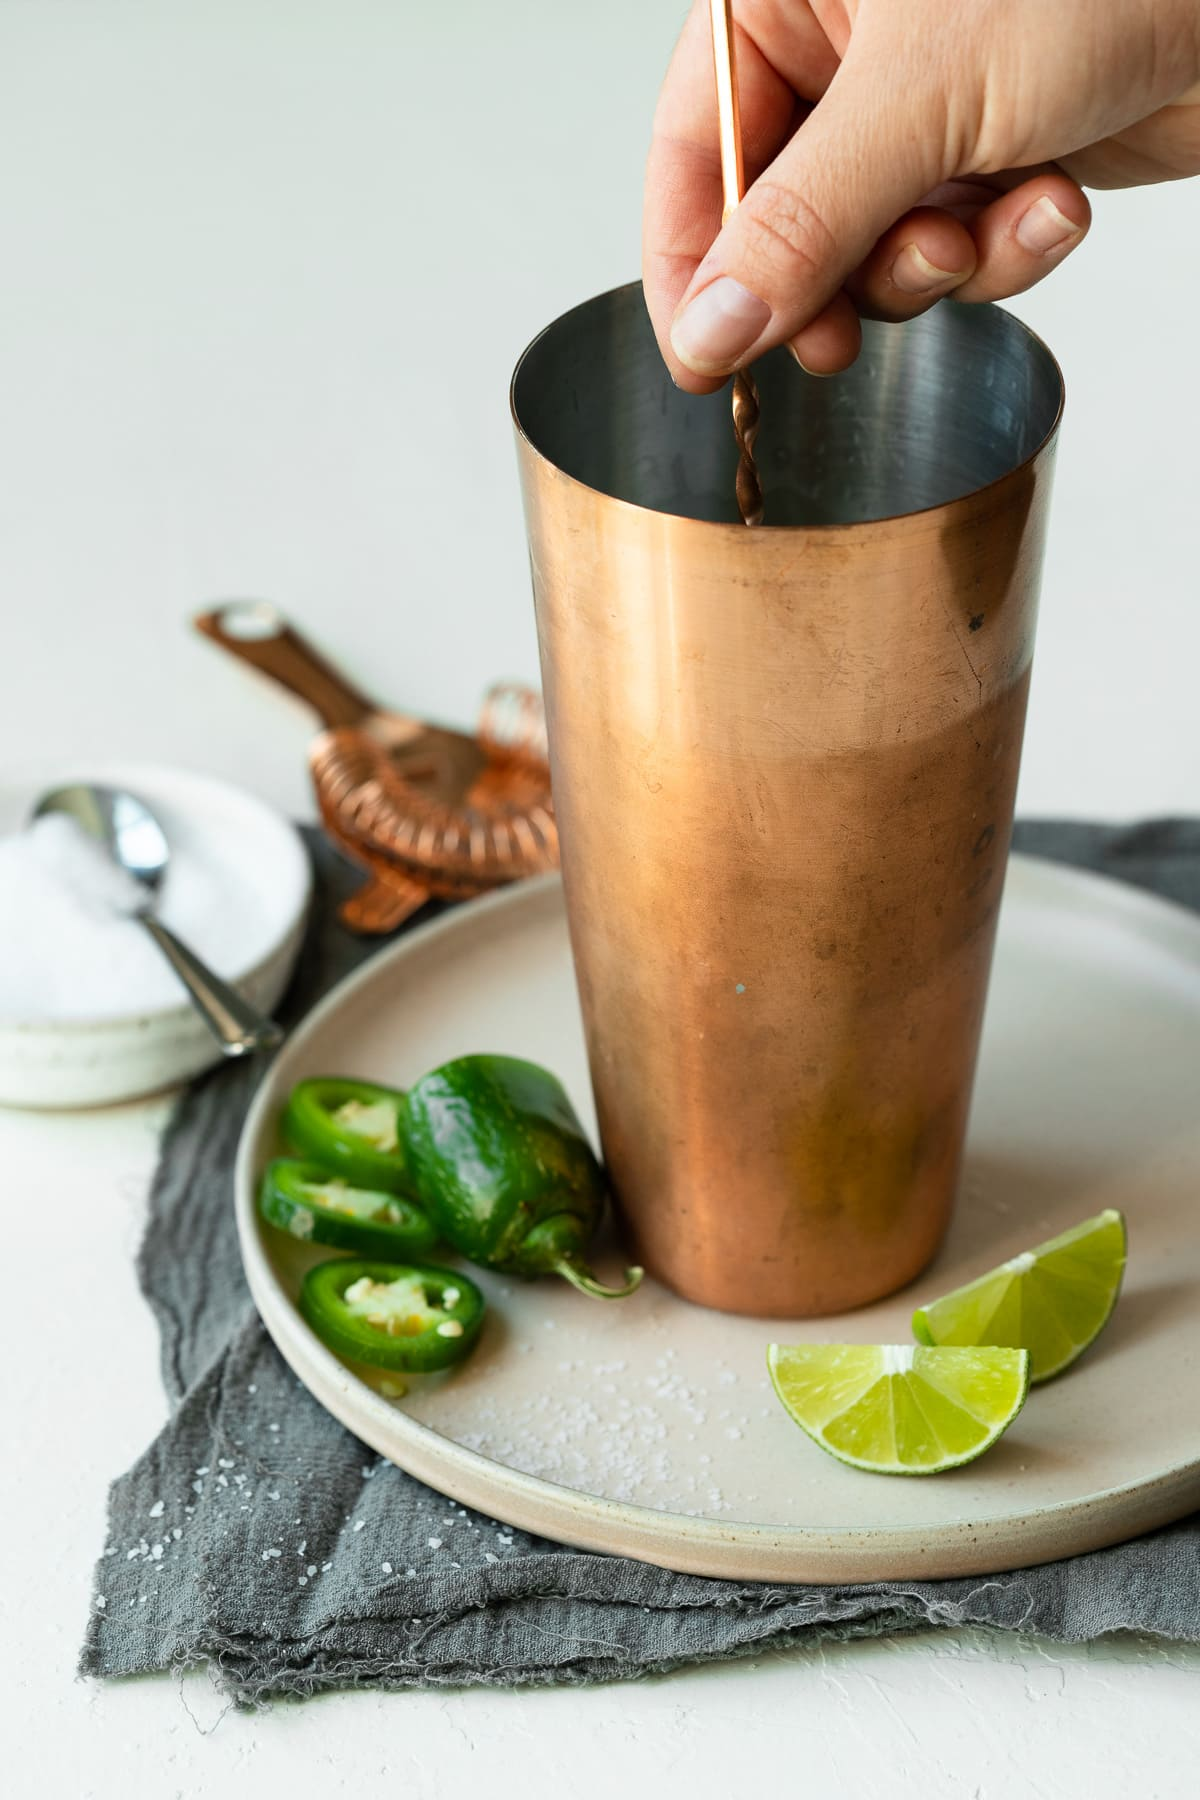 Margarita ingredients being stirred in a cocktail shaker.